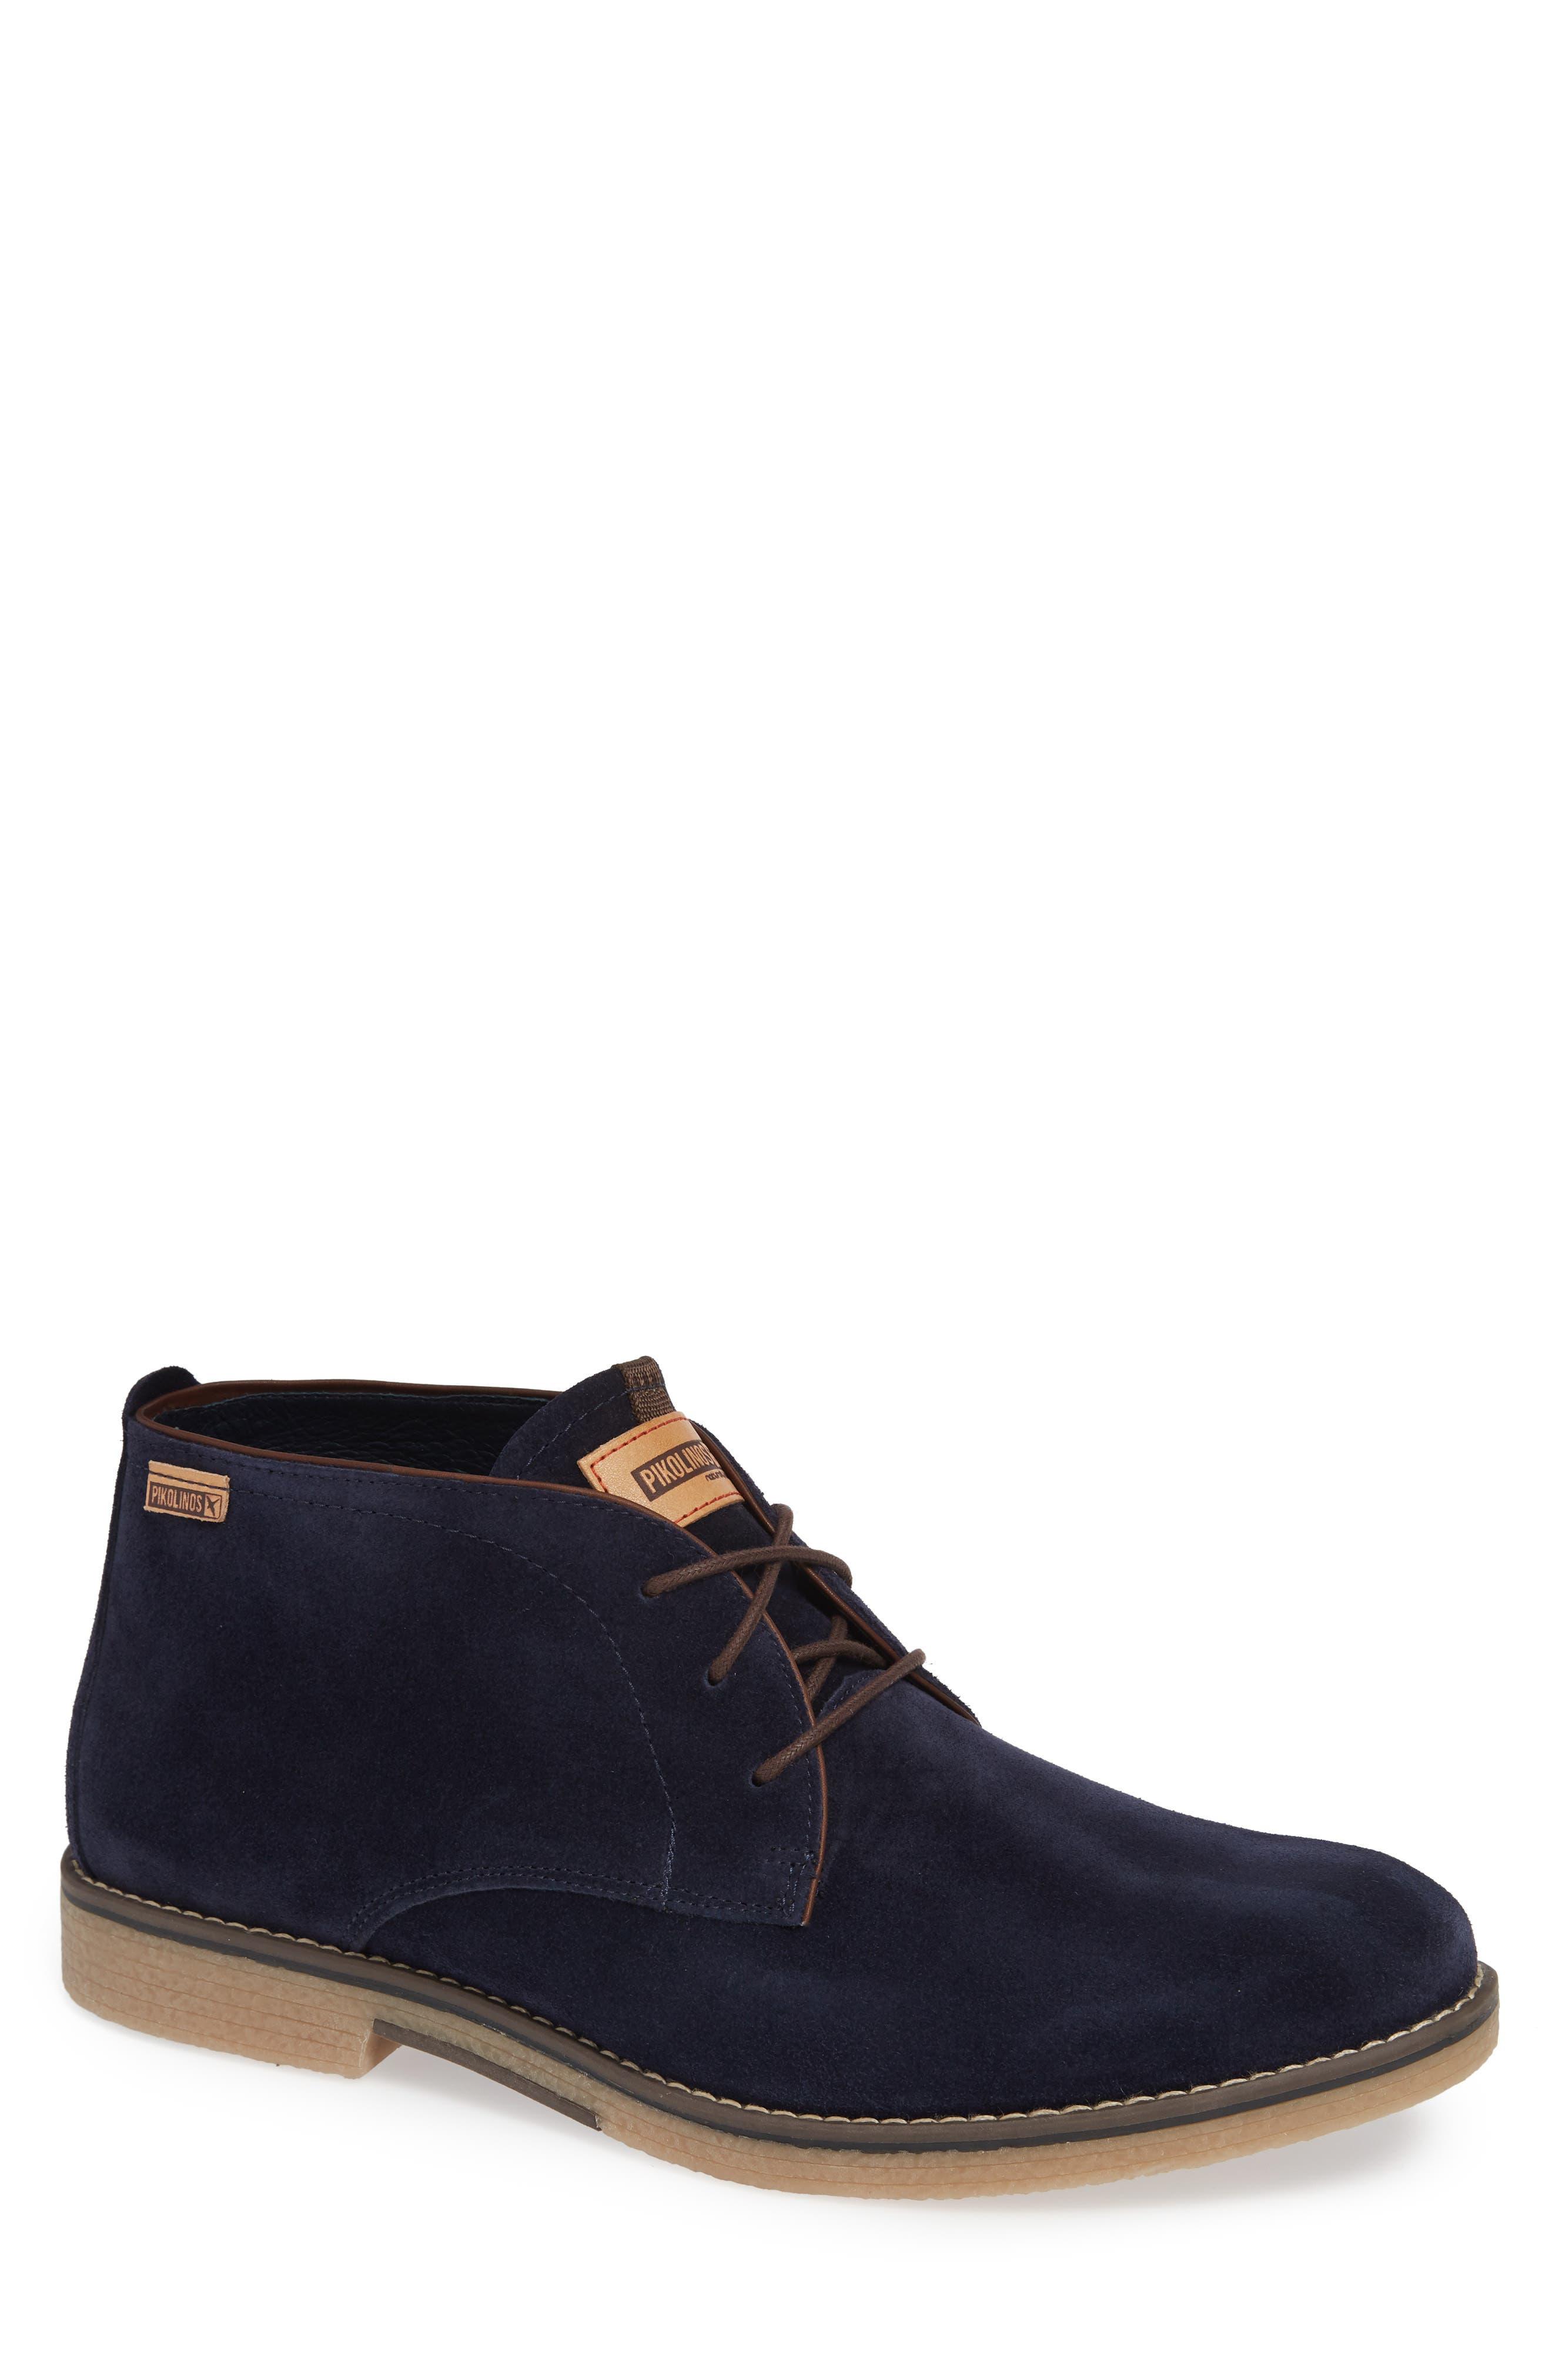 Irun Plain Toe Chukka Boot,                         Main,                         color, NAVY